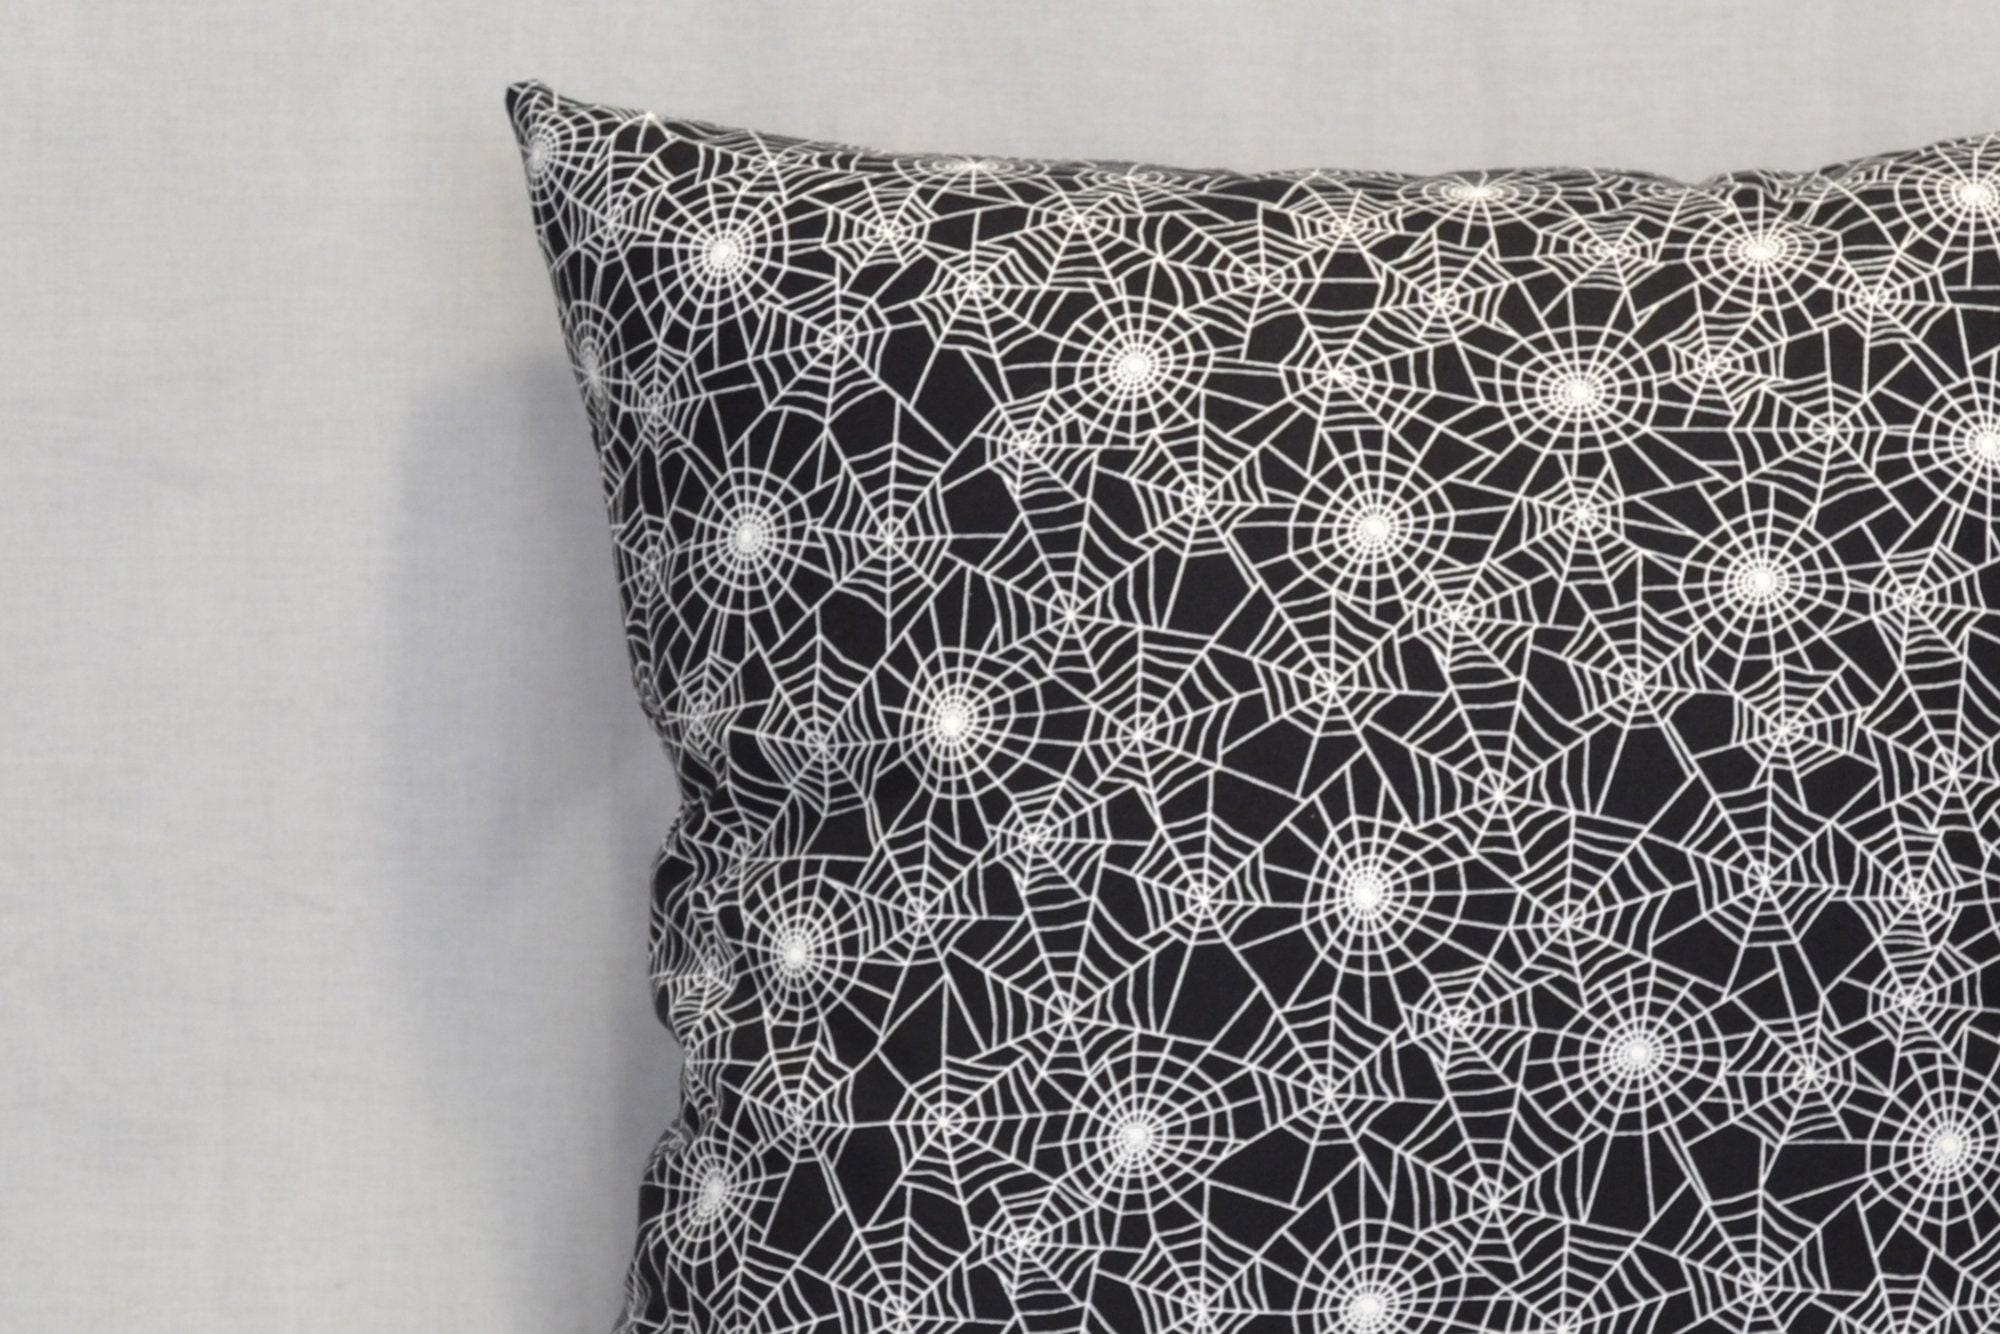 Glow In The Dark Spider Webs 18 Inch Throw Pillow Goth Punk Home Decor Halloween Decorative Pillow